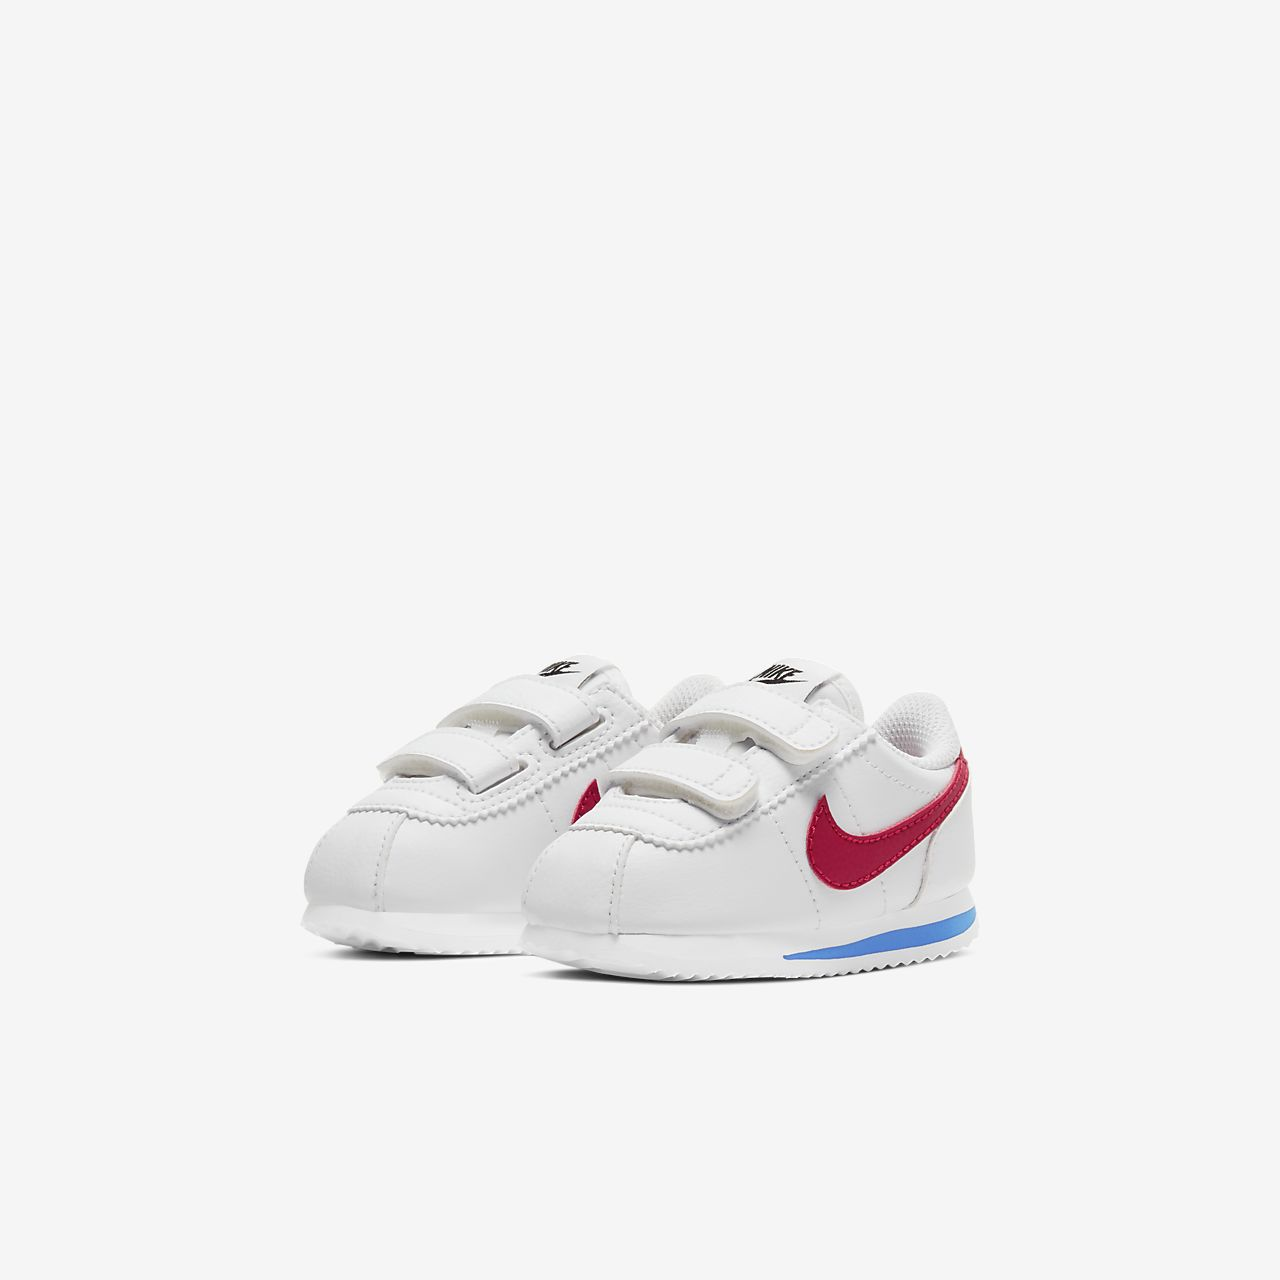 buy online 86a3d 4dd86 ... Nike Cortez Basic SL Baby   Toddler Shoe